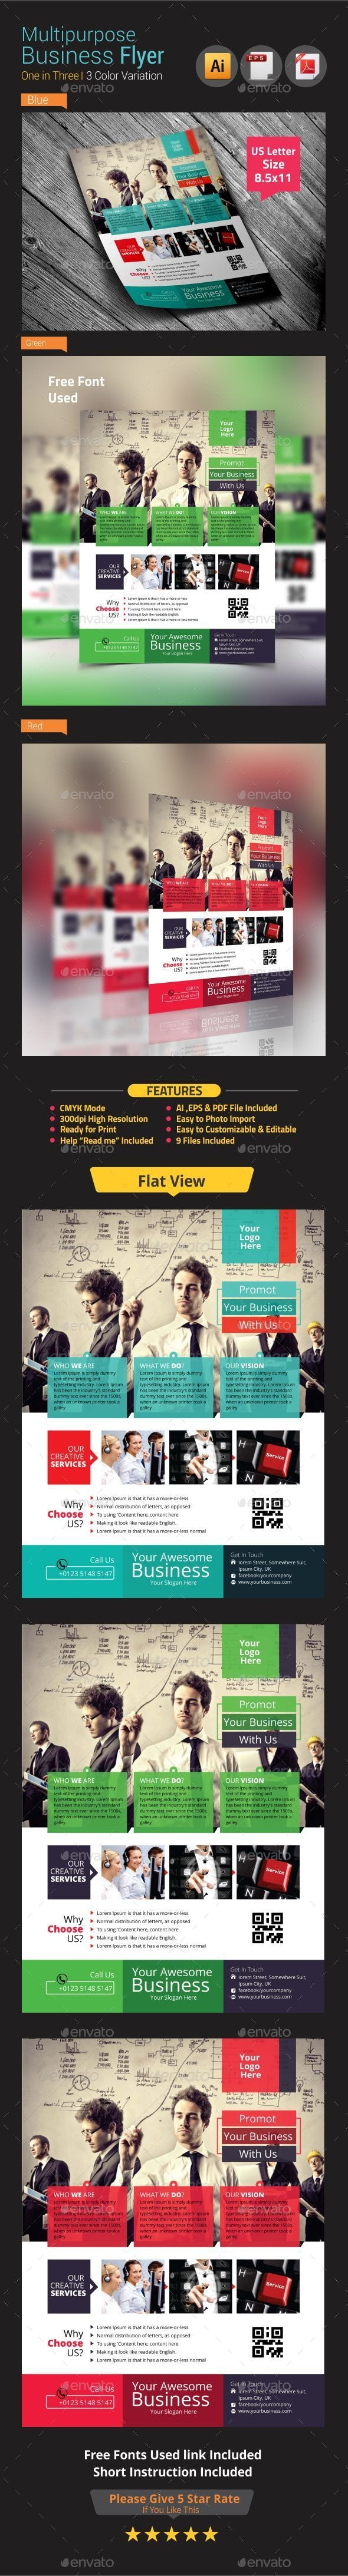 Multipurpose Business Flyer Vol-2 - Corporate Flyers